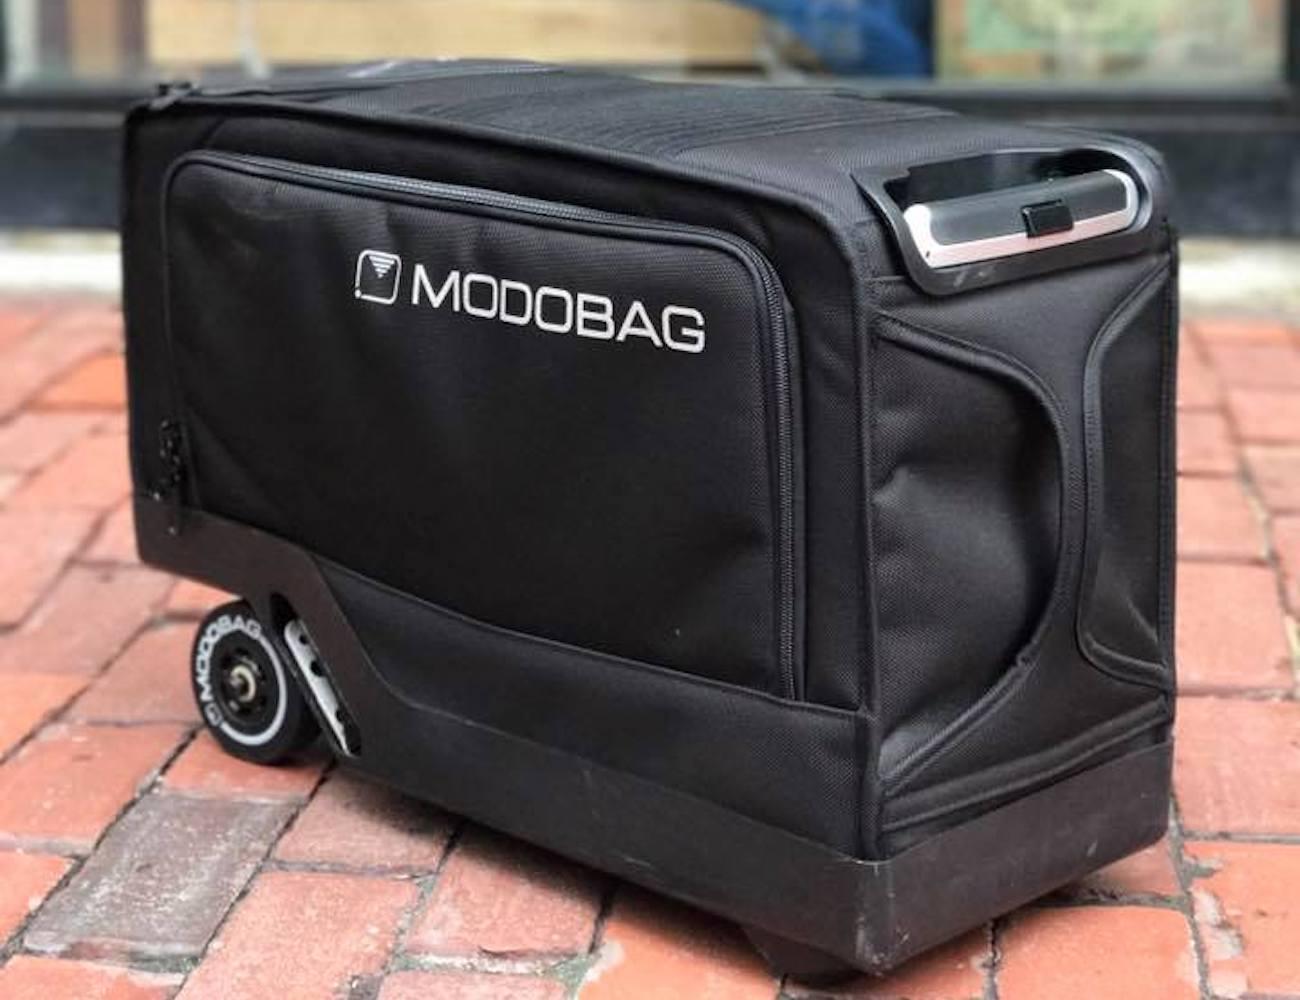 Modobag Motorized Rideable Carry-On Luggage